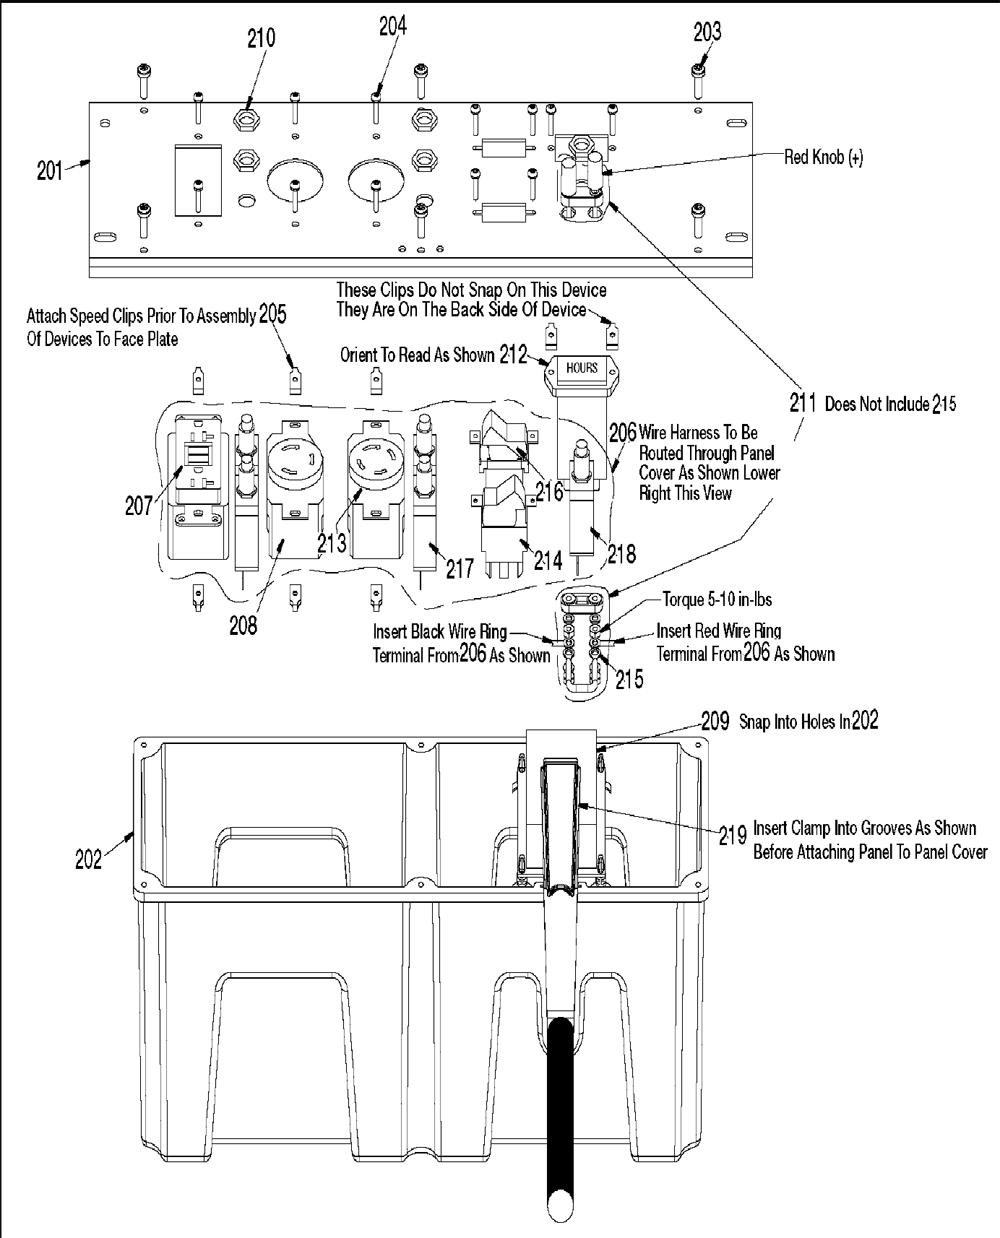 H450IS-W-Portercable-PB-3Break Down